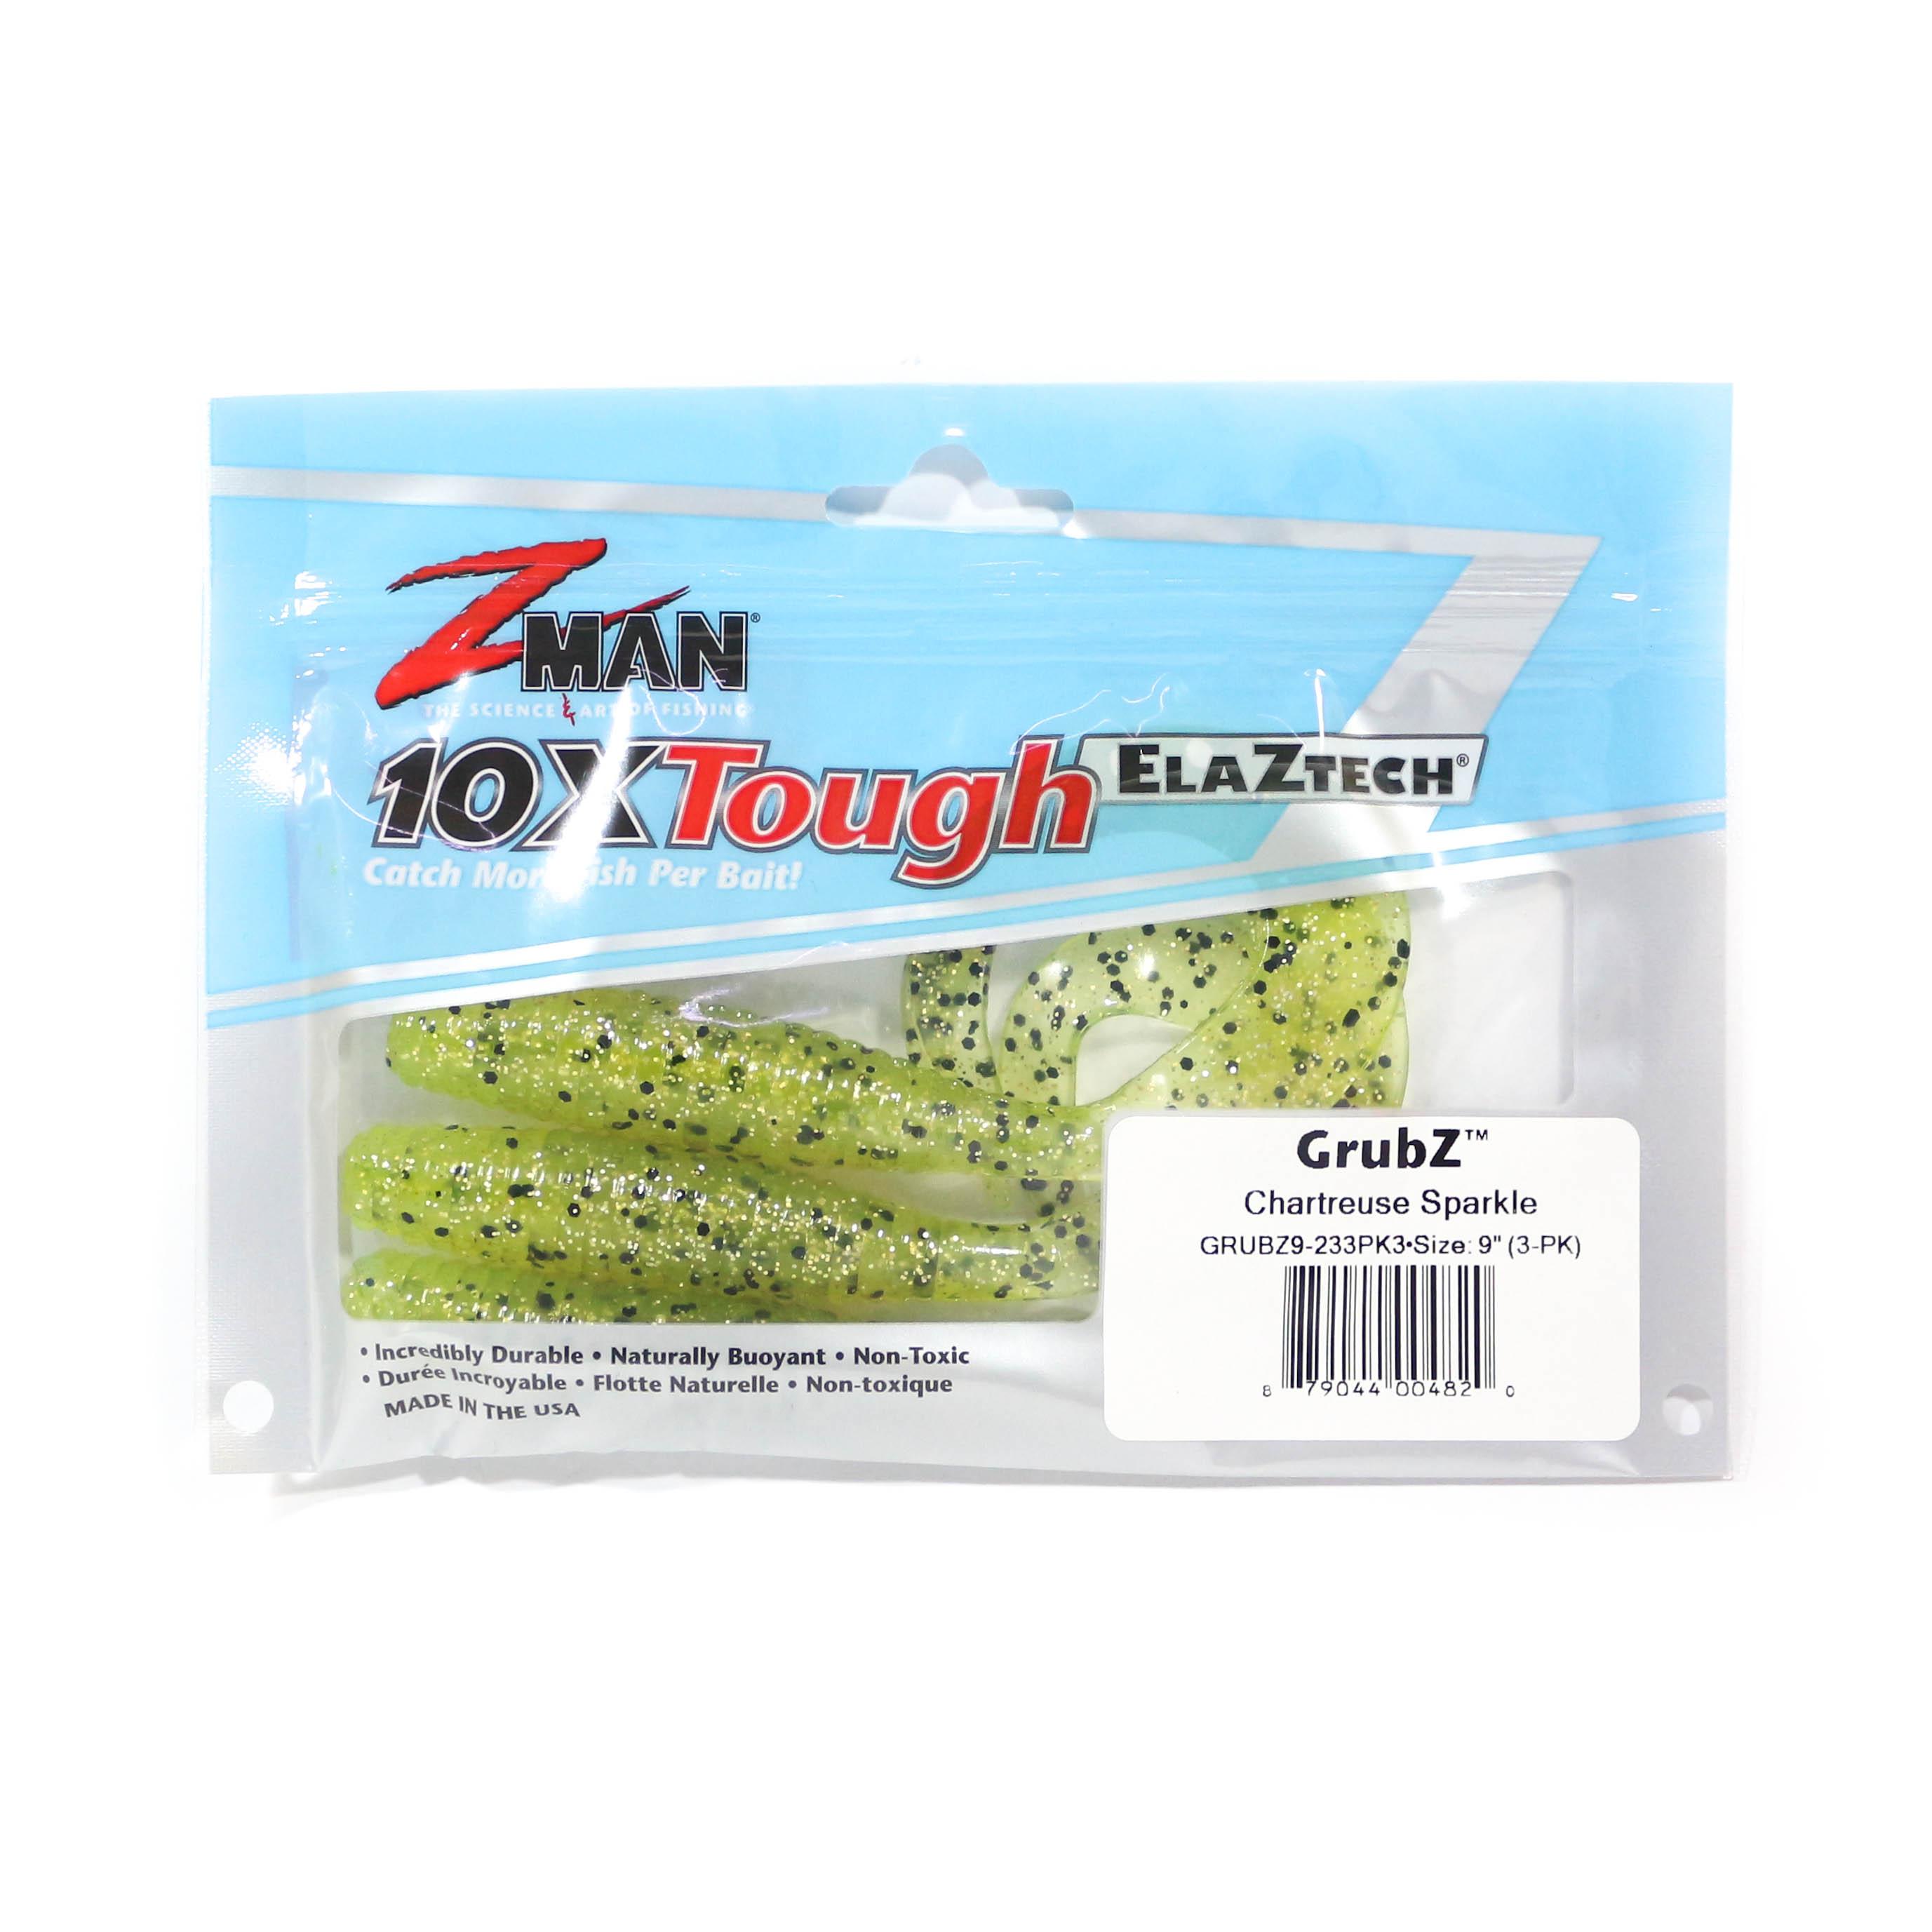 Zman Soft Lure GrubZ 9 Inch 3 per pack Chartreuse Sparkle (4820)